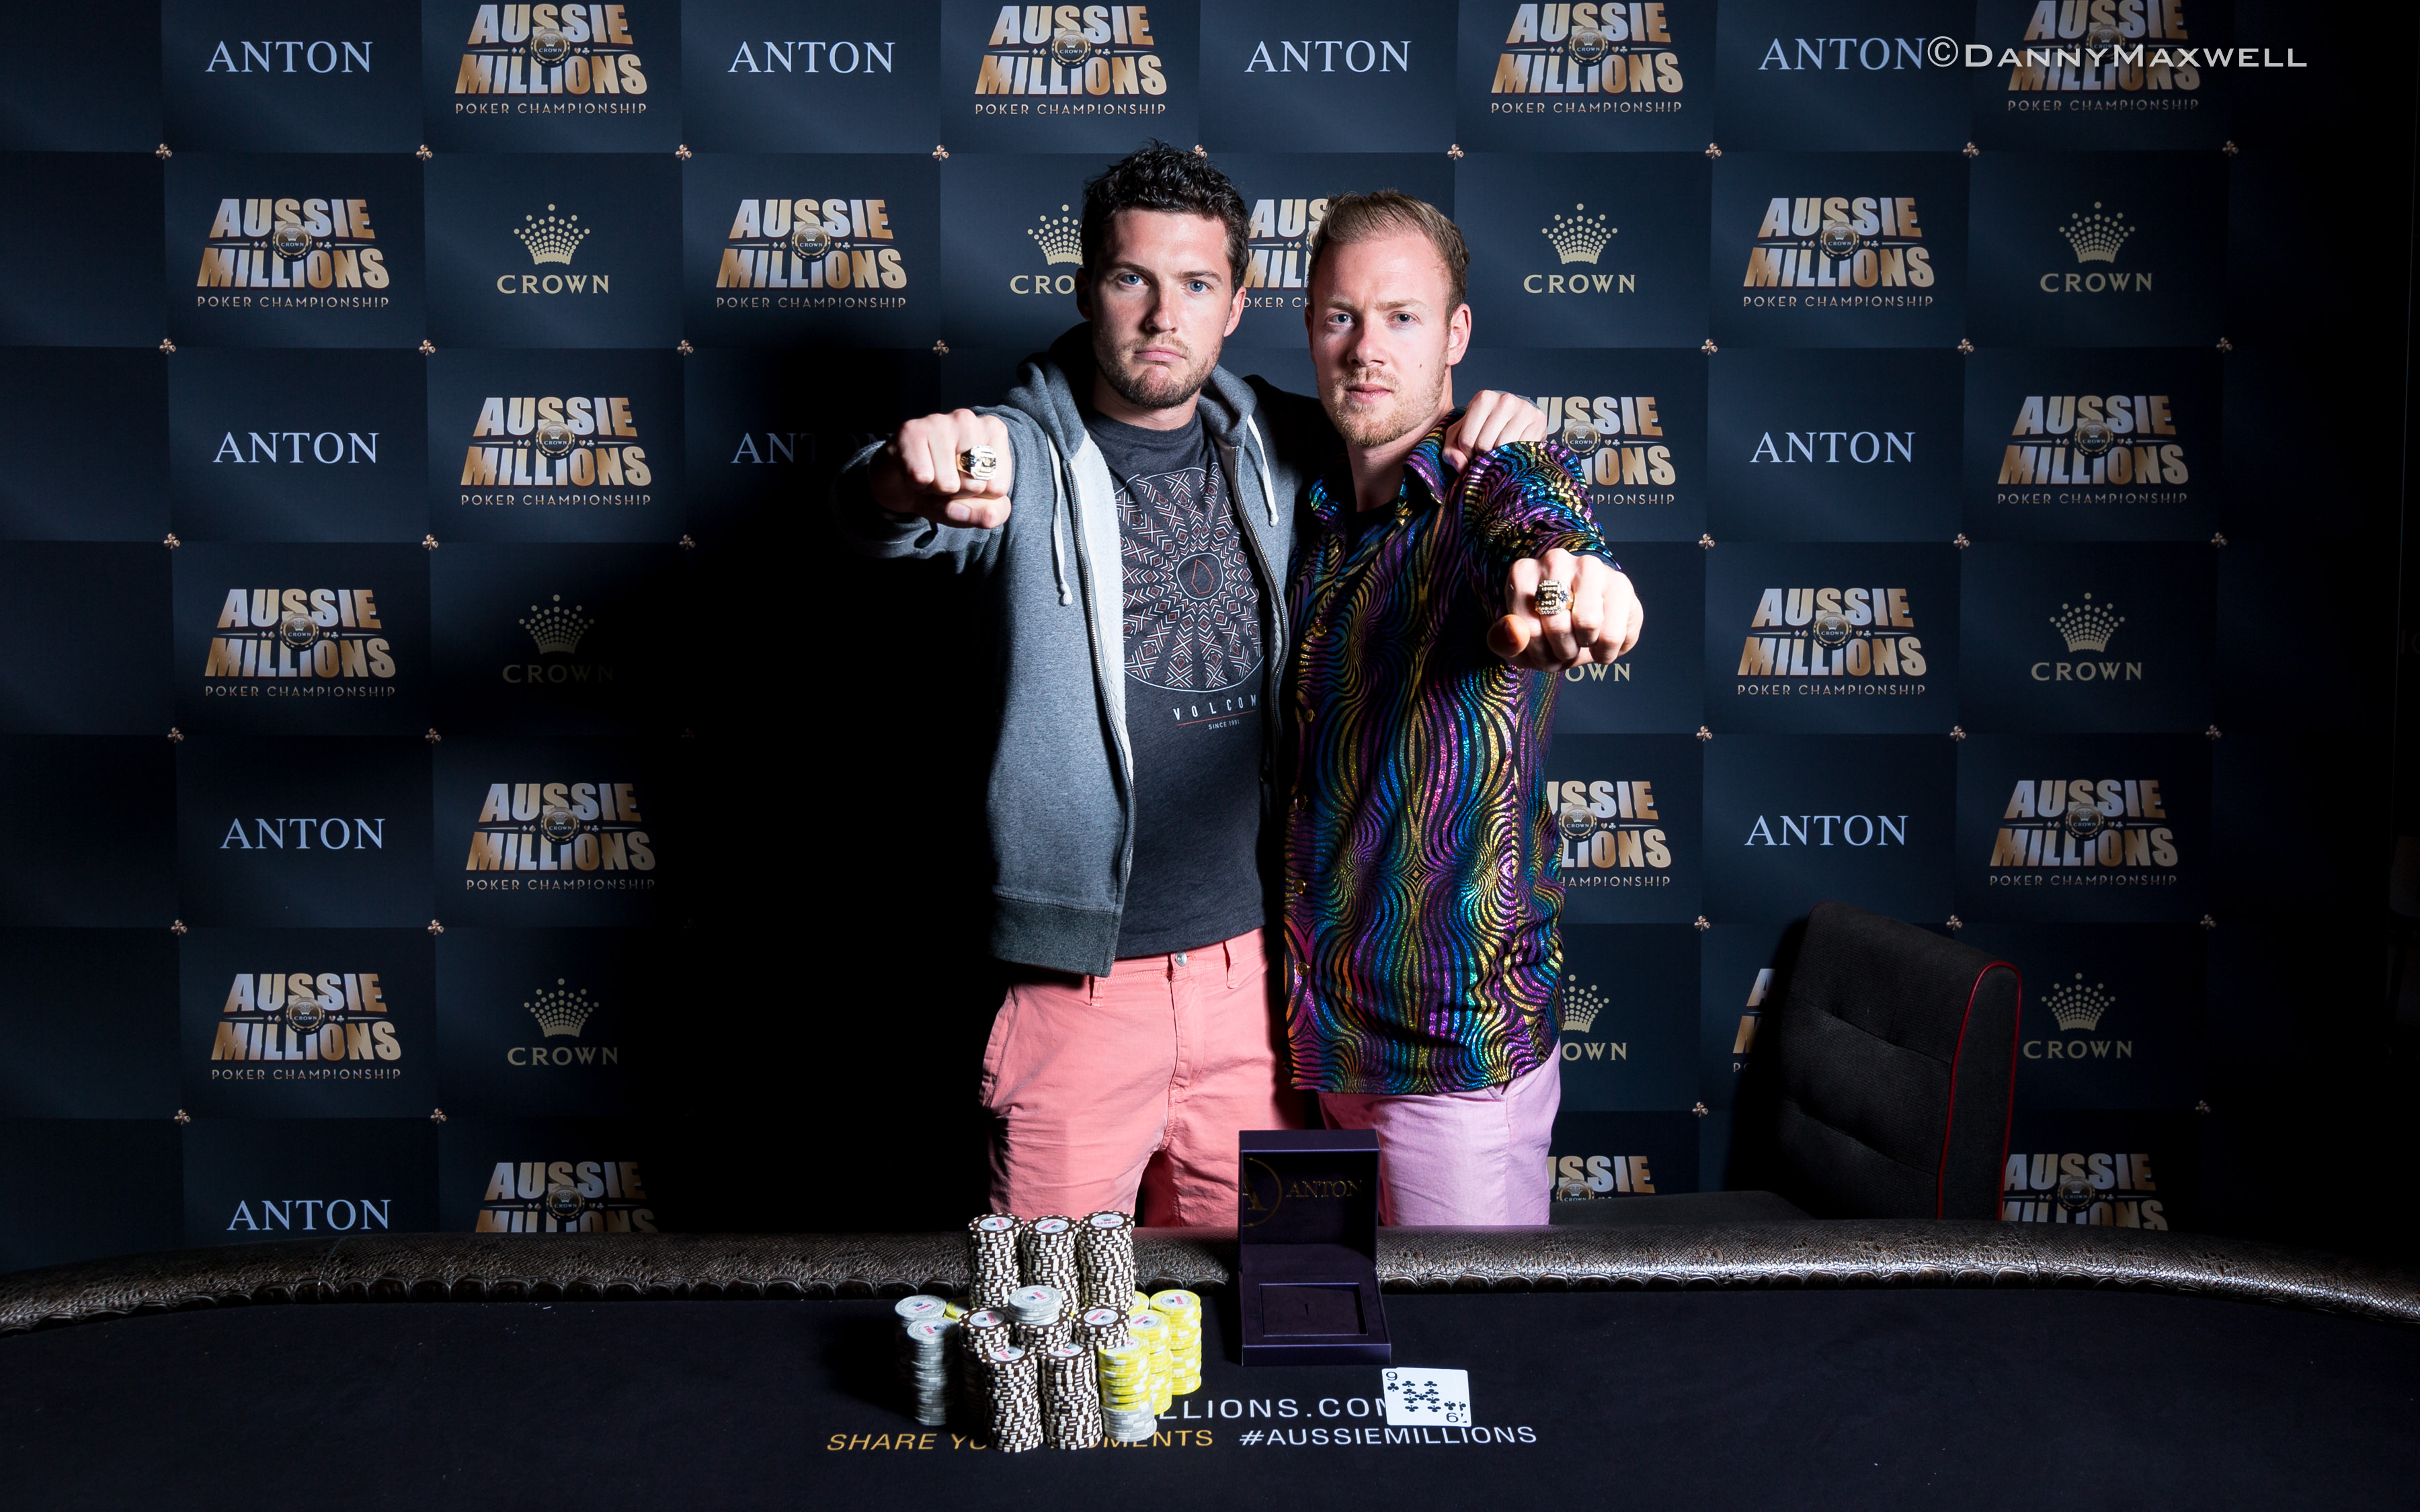 Terry Schumacher Beats David Yan to Win Aussie Millions Short Handed Event 101